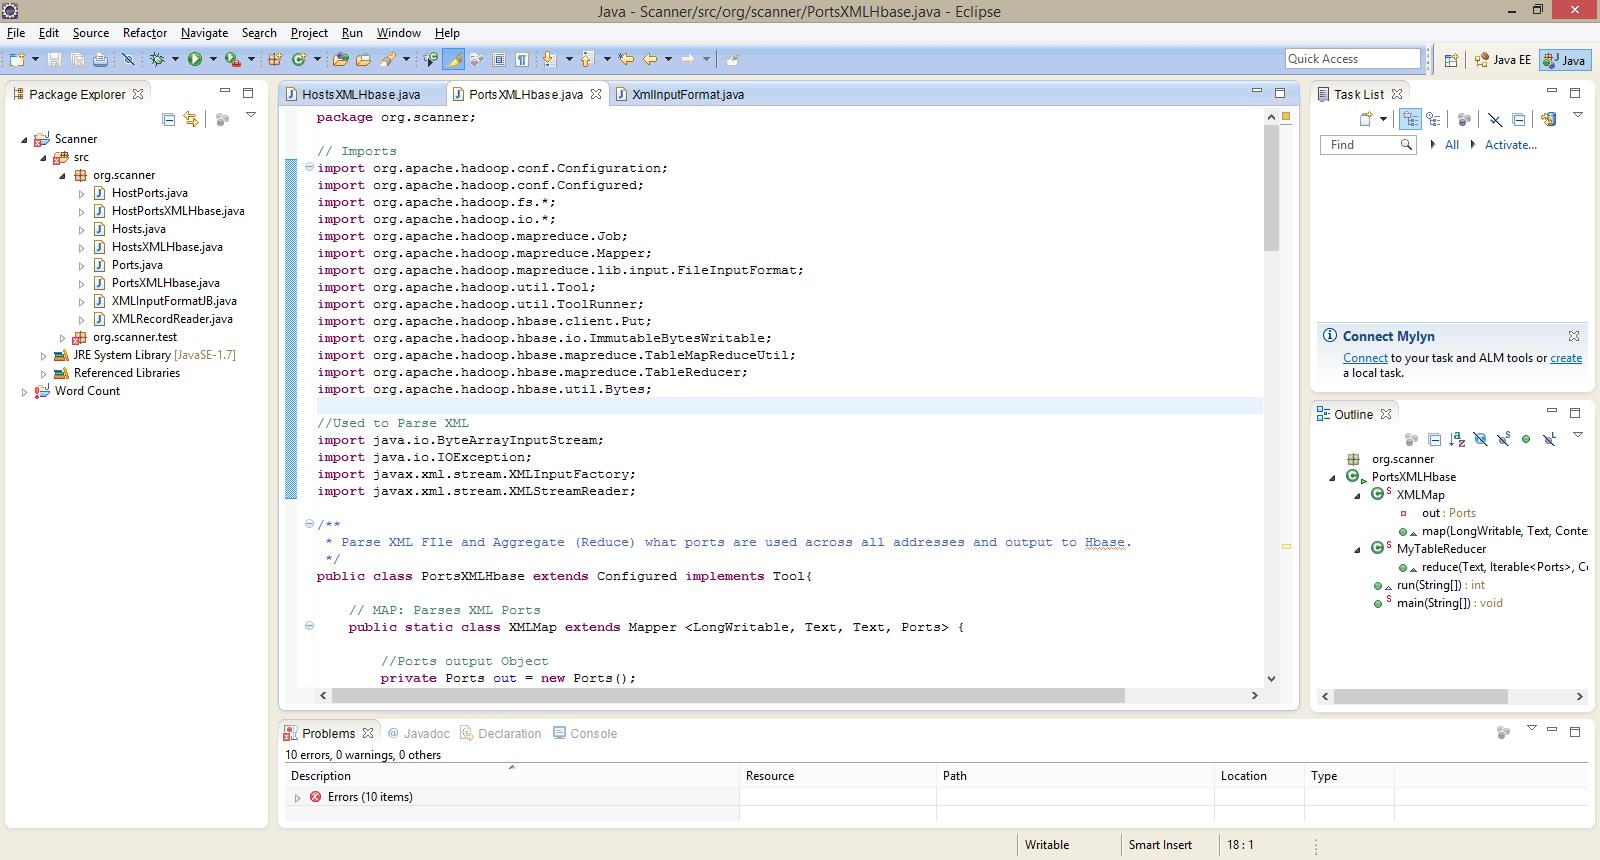 Compile Java Source File Eclipse - internetneat